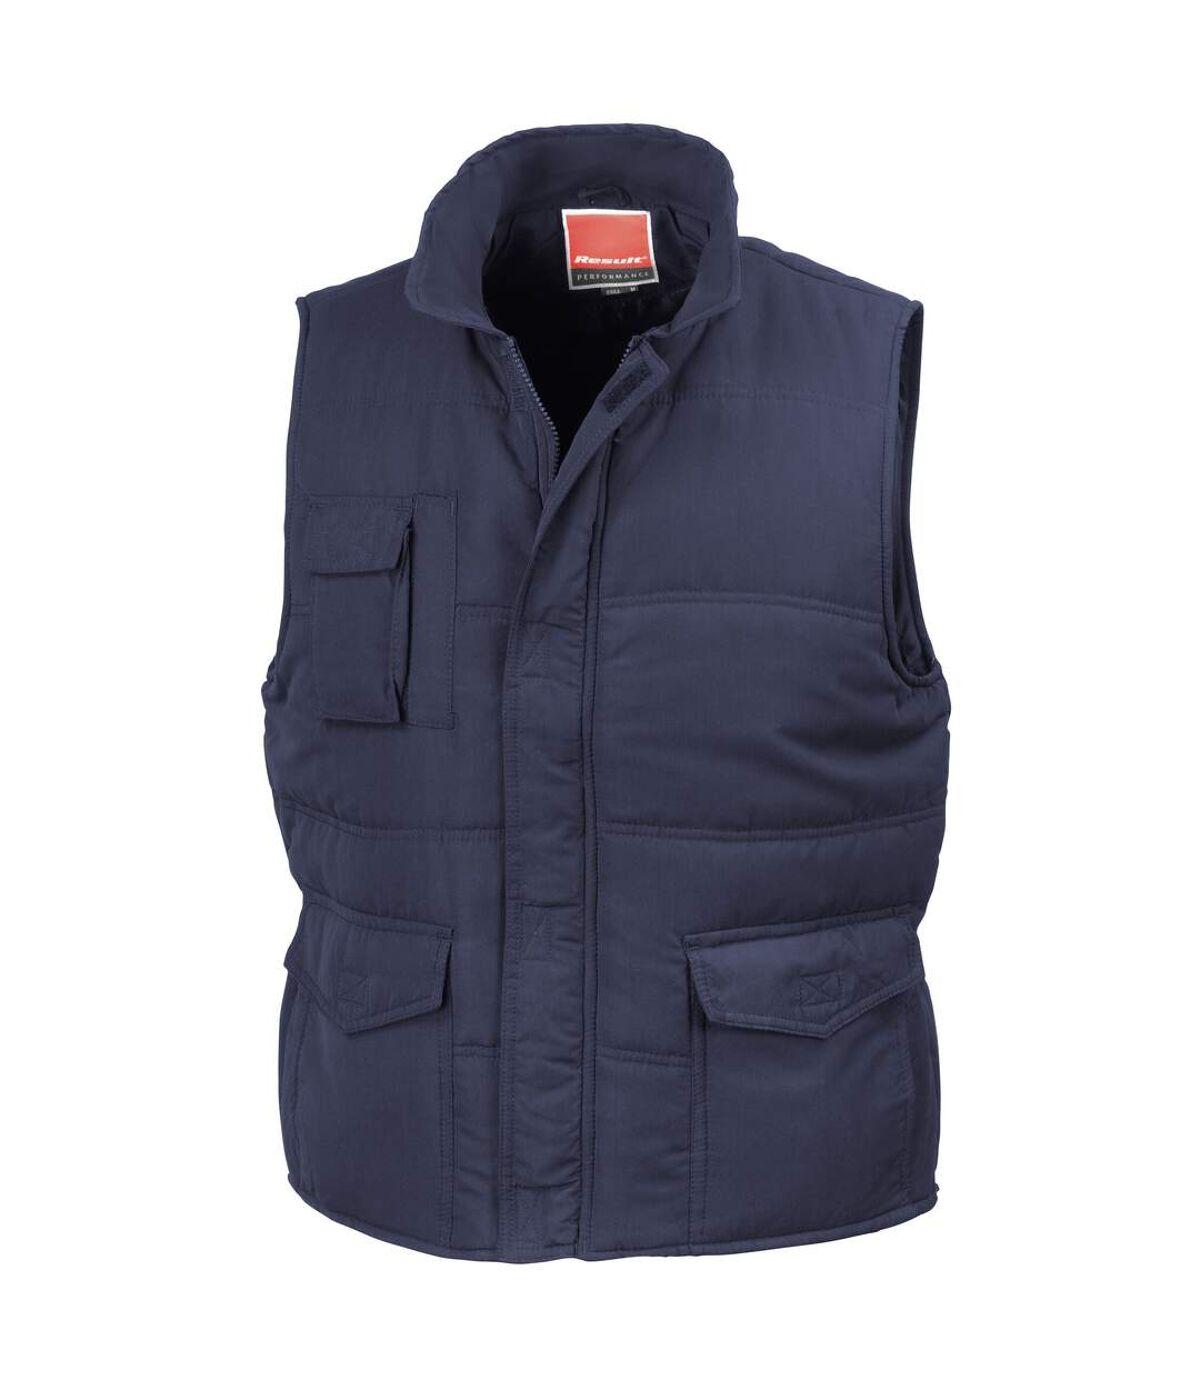 Result Mens Mid-Weight Bodywarmer Showerproof Windproof Jacket (Navy Blue) - UTBC939